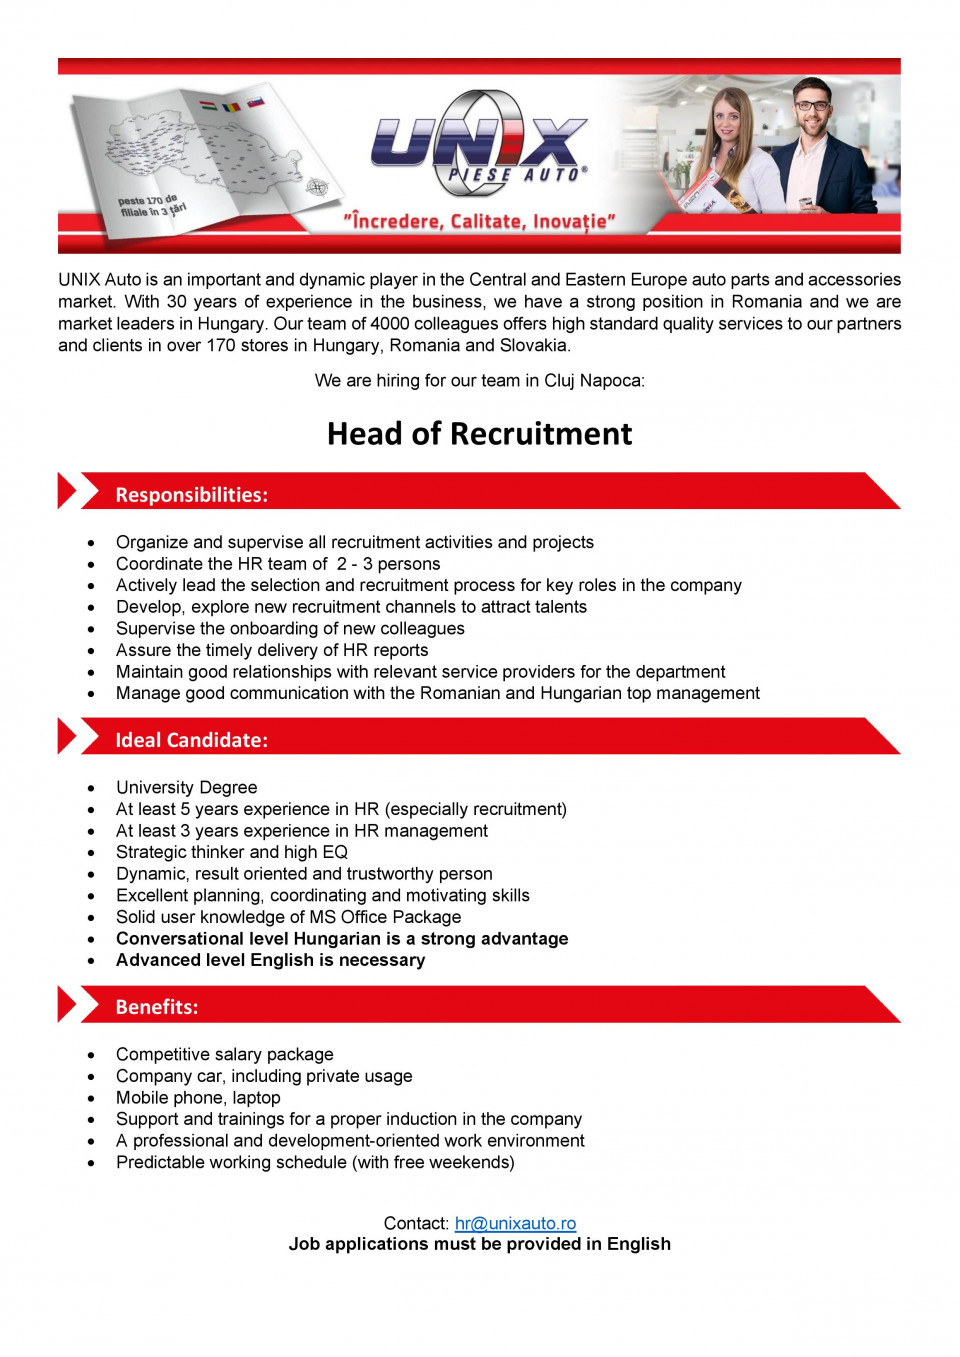 Head of Recruitment